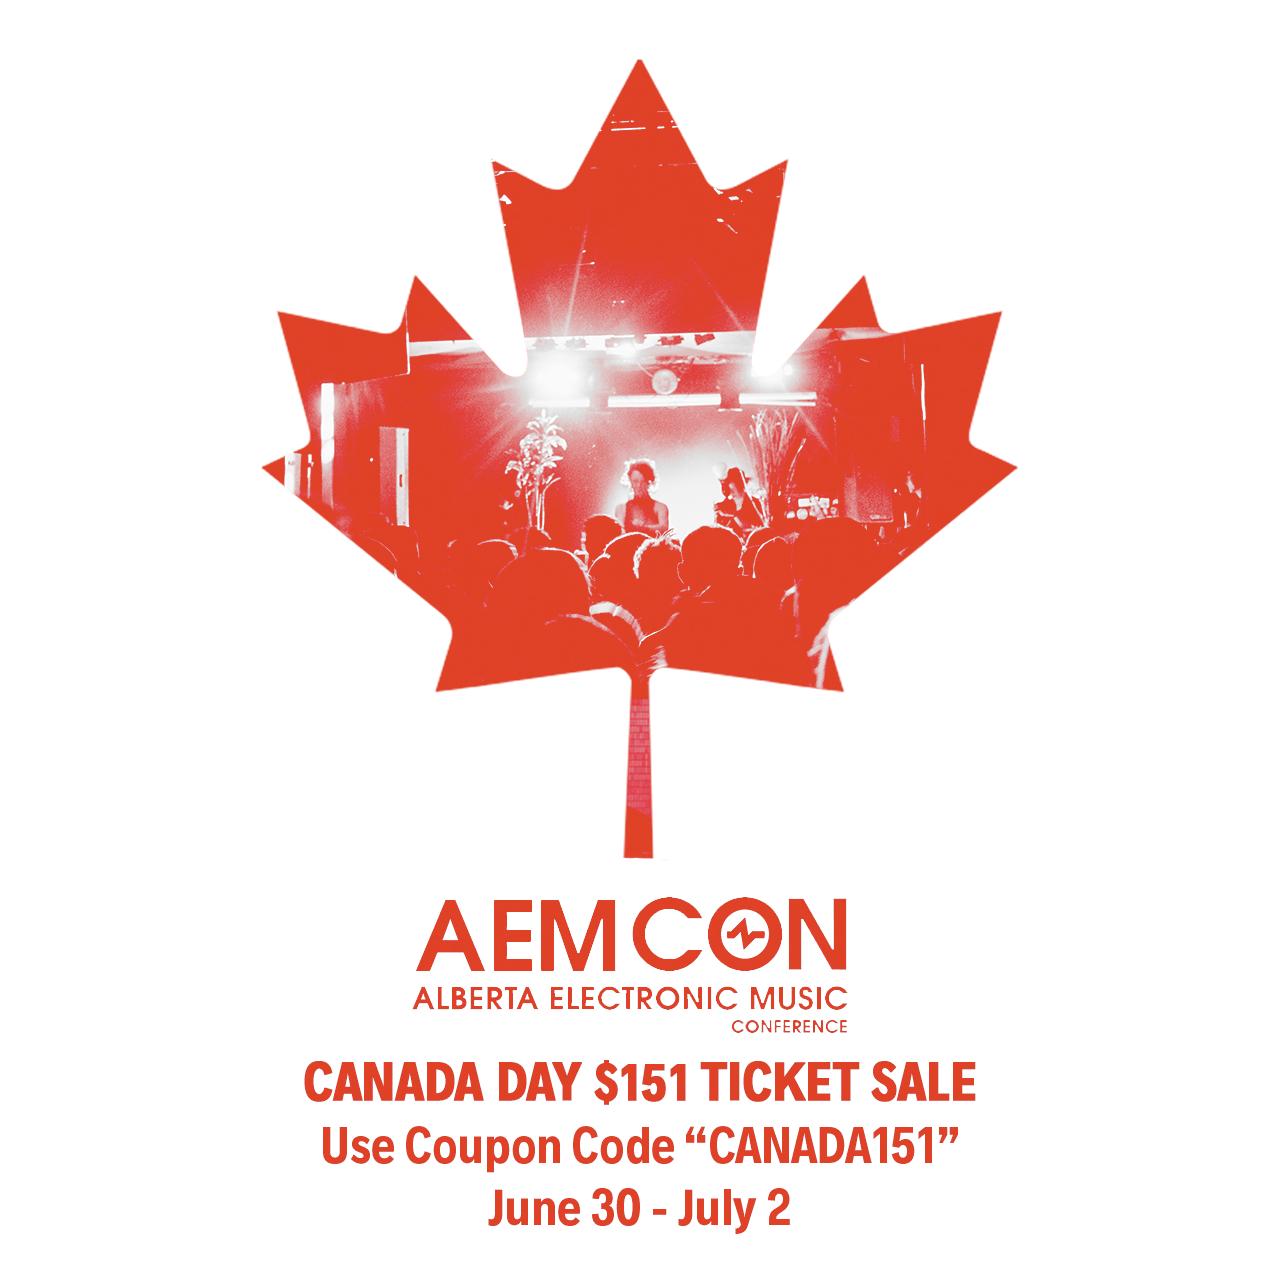 Canada Day AEMCON Promo